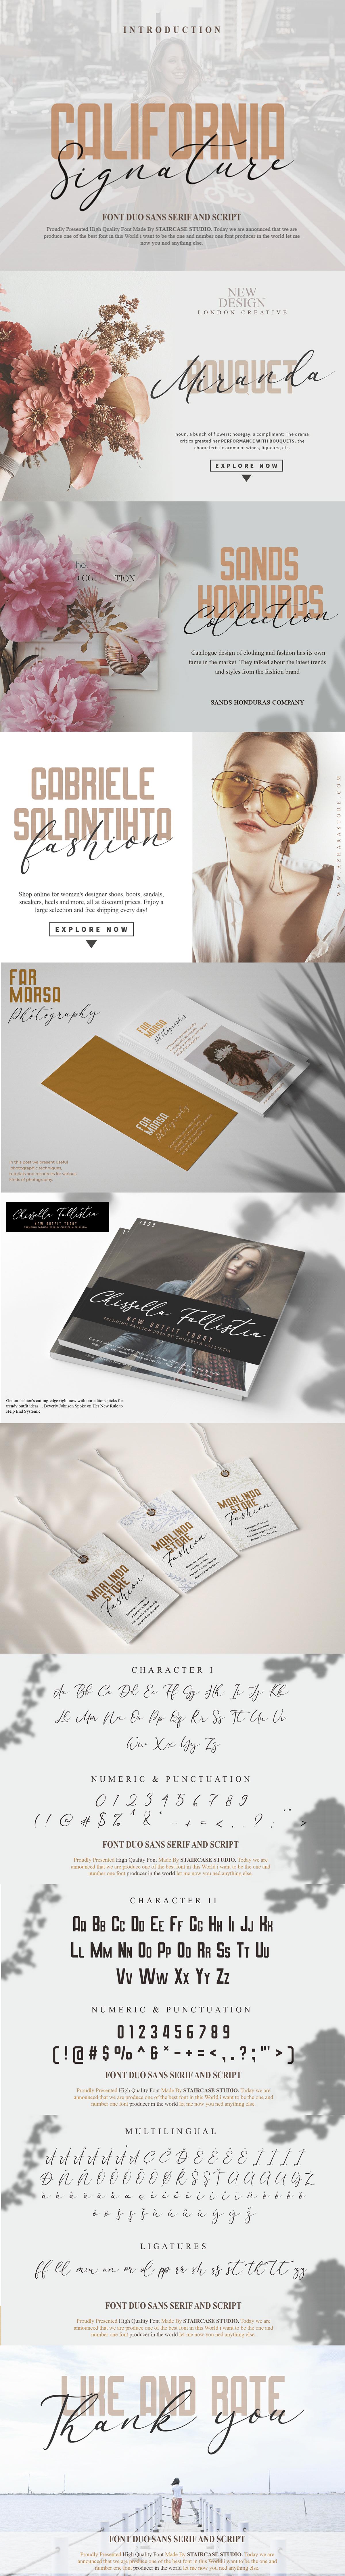 branding  California font duo fonts Invitation Logotype sans serif Script signature typewriting